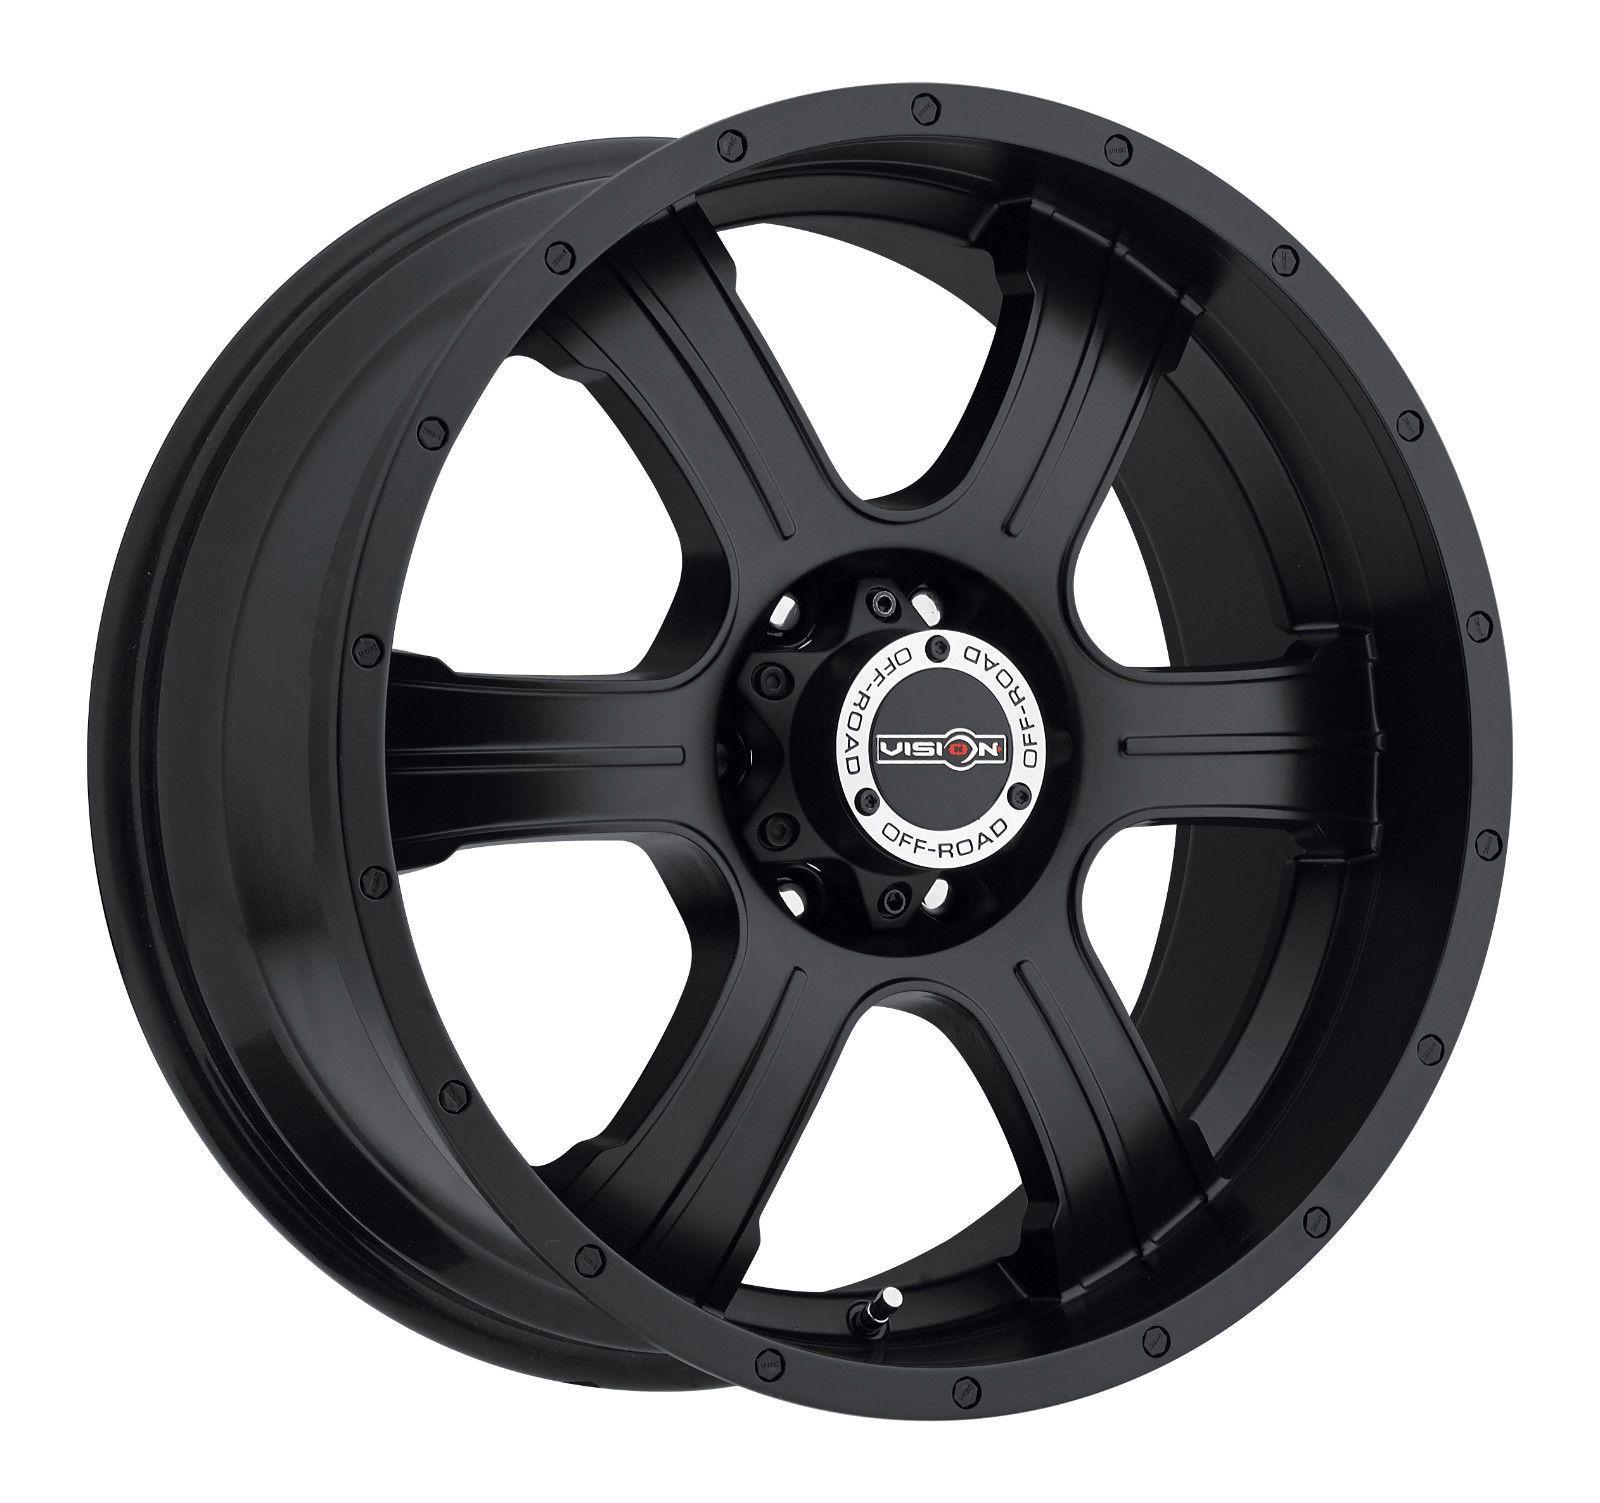 4 New 20 Wheels Rims For Isuzu Trooper 6 Lug 25060 Black Wheels Wheel Rims Truck Rims